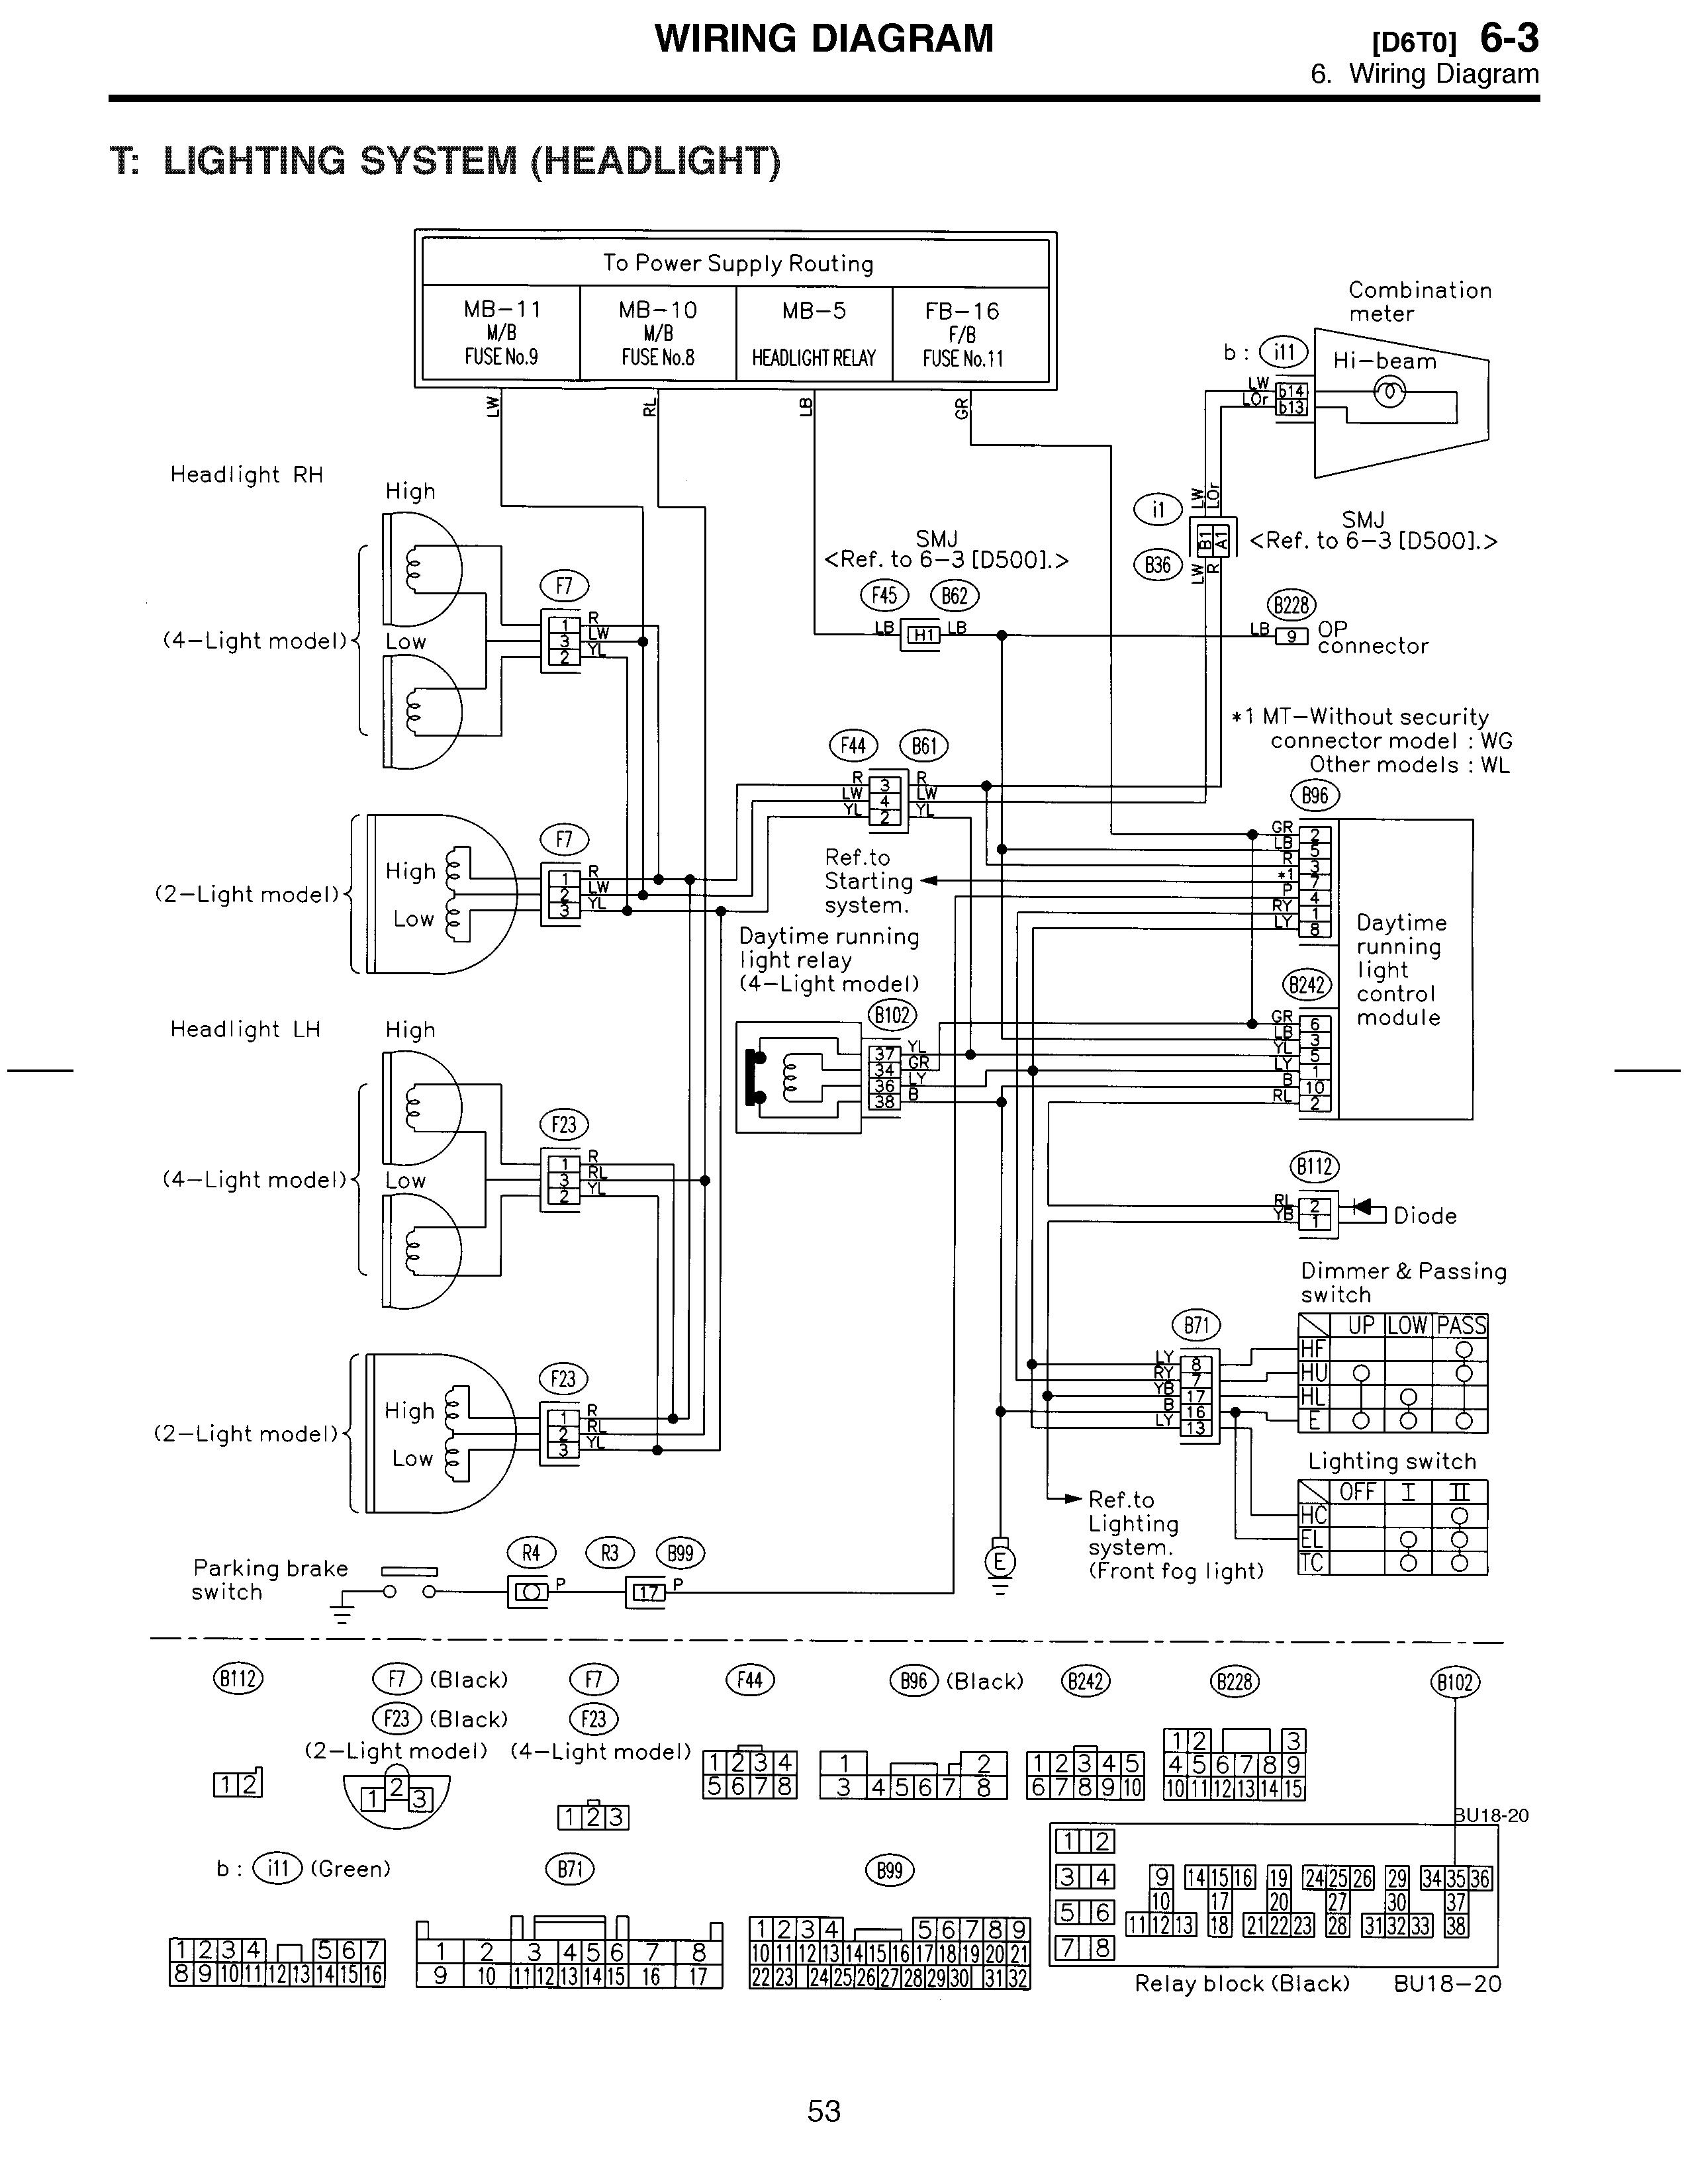 2010 Subaru Legacy Headlight Wiring Diagram Basic Schematic B4 1995 Engine